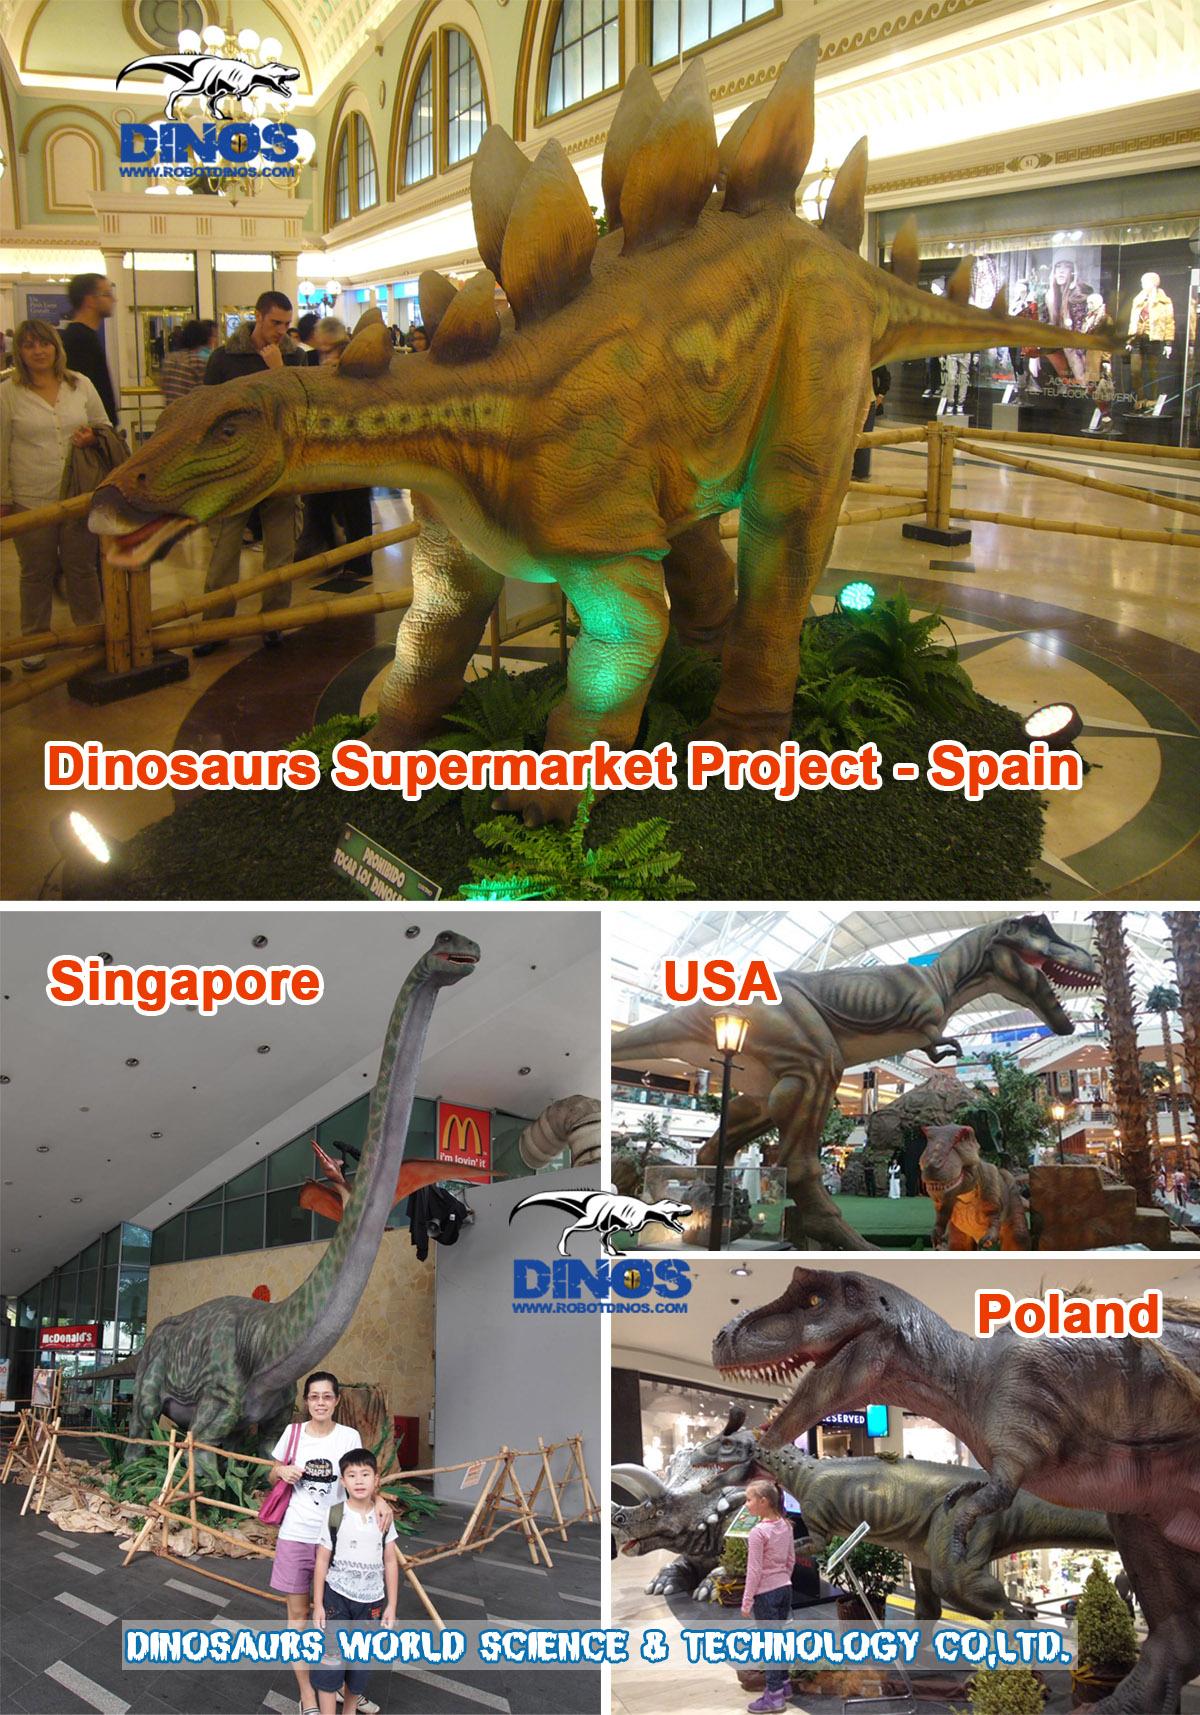 animatronic dinosaurs,supermarket dinosaurs,supermarket attraction